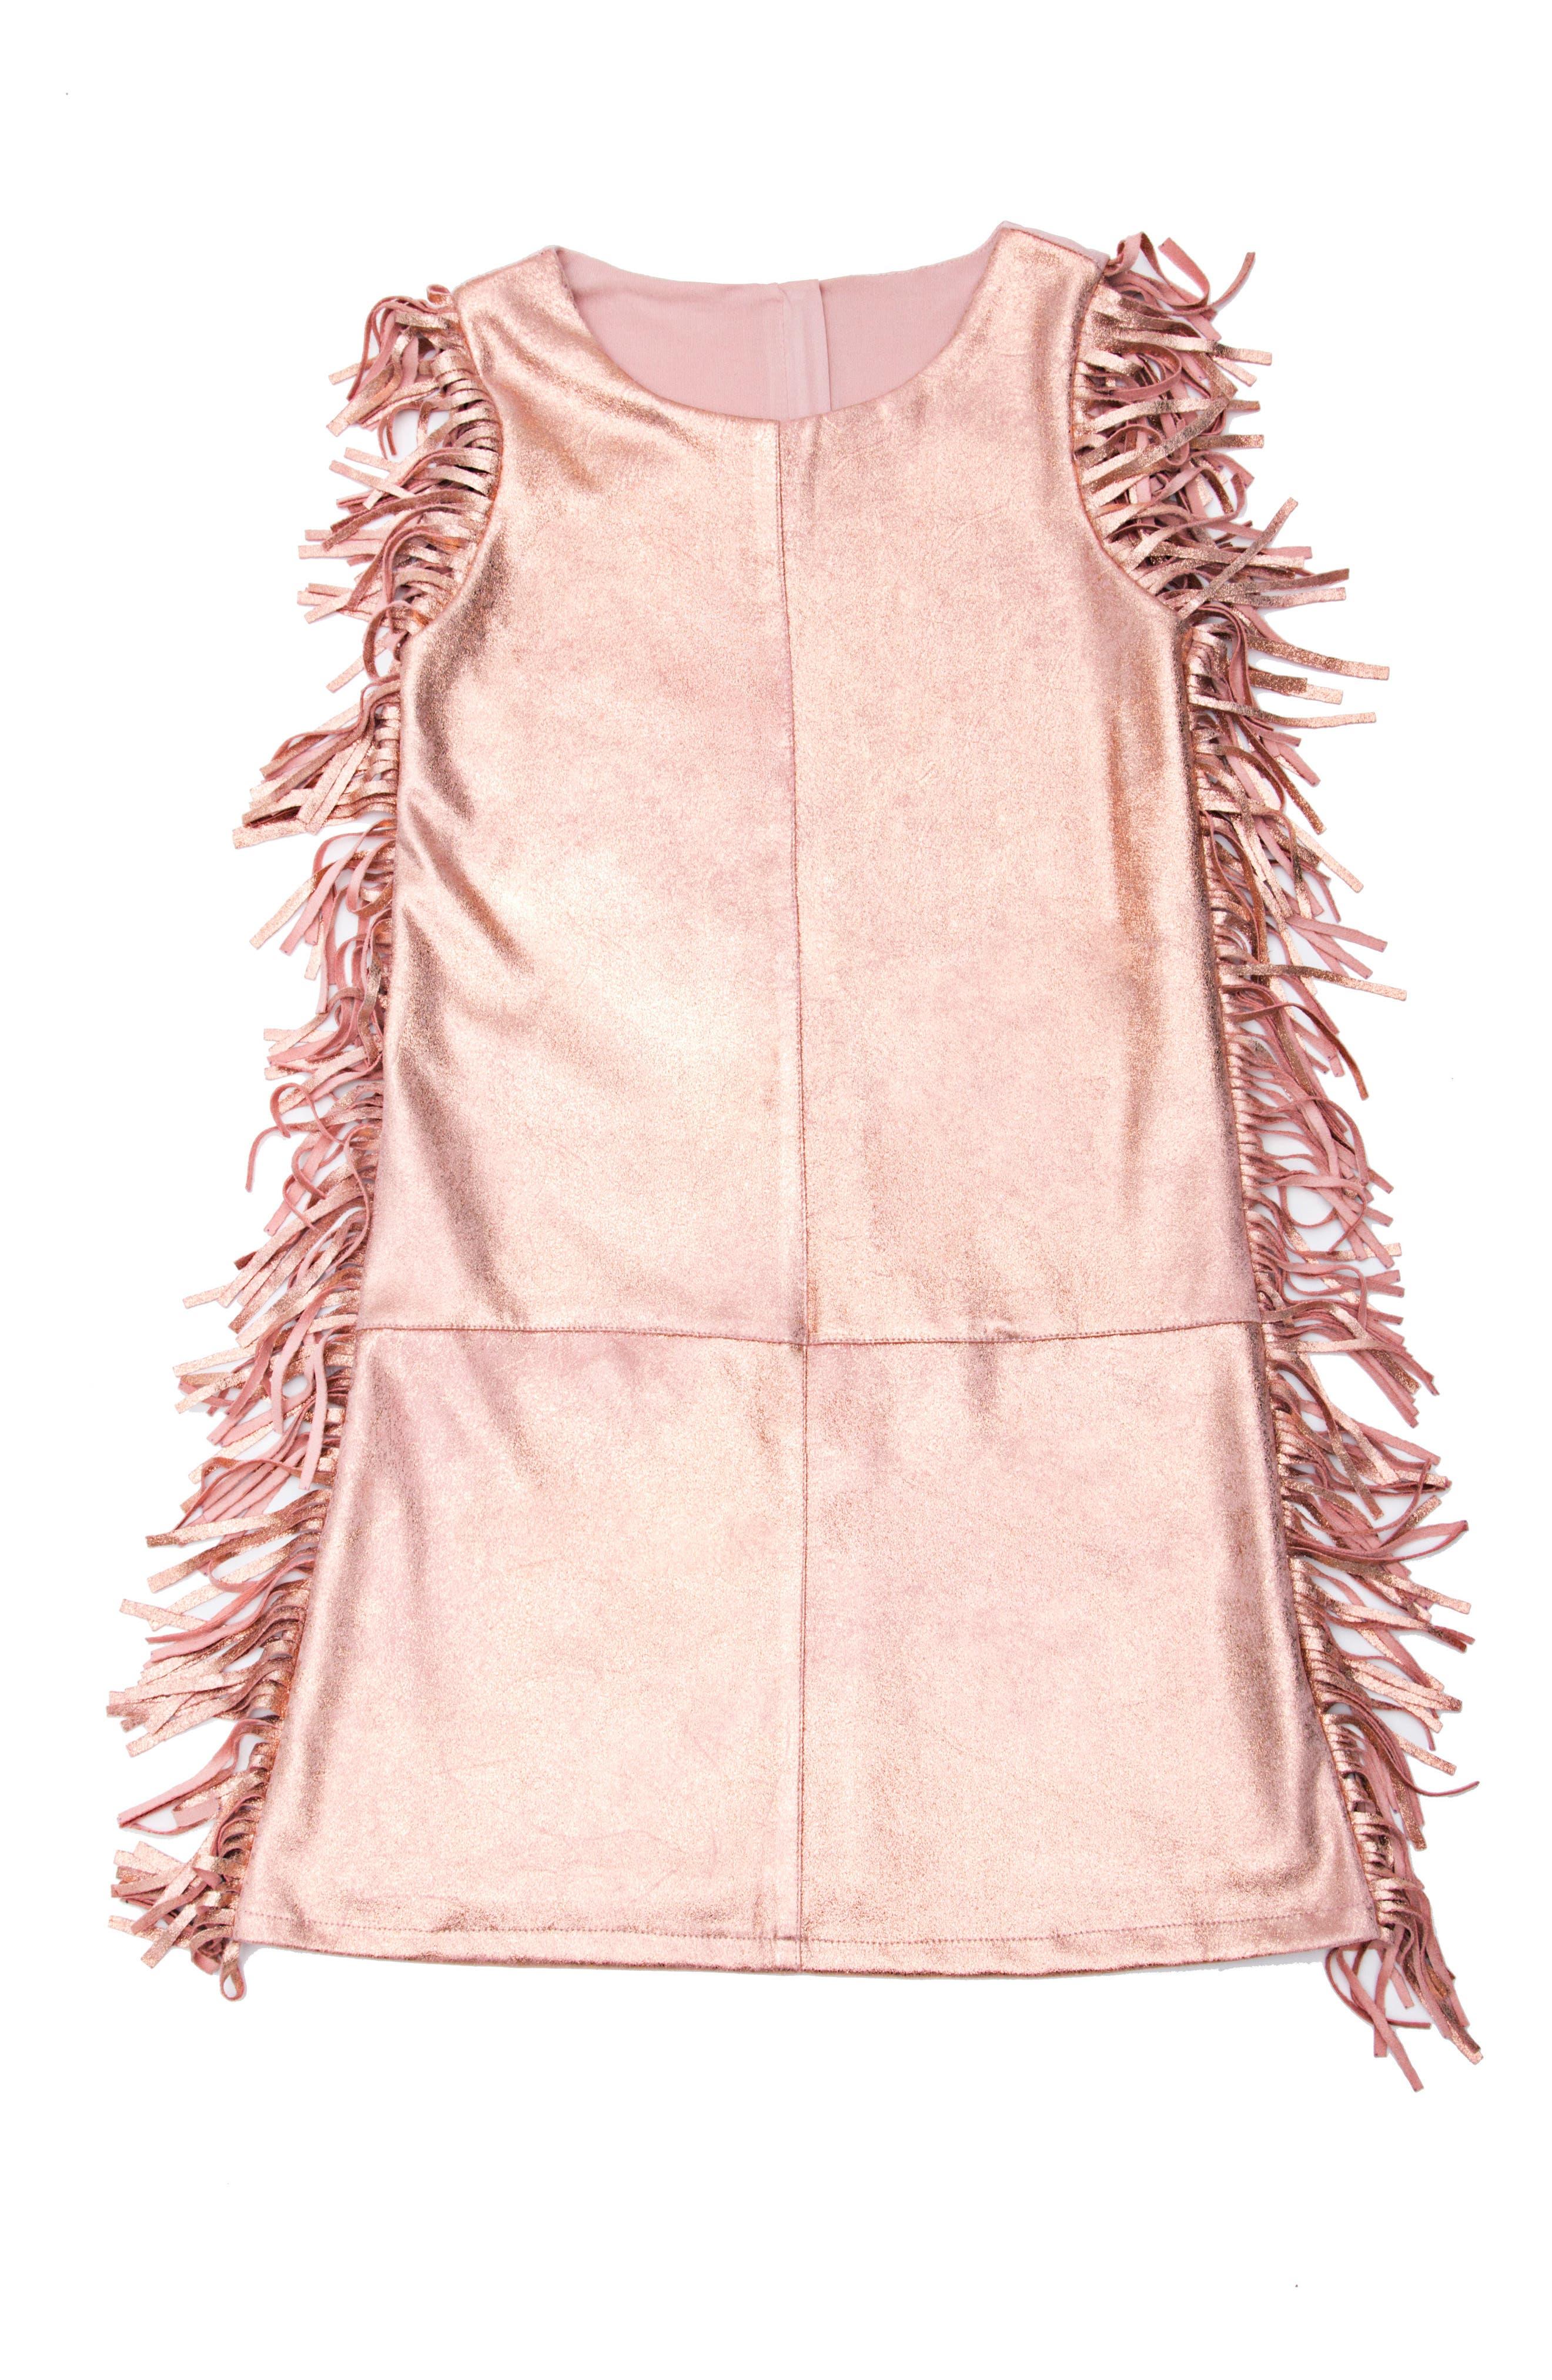 Metallic Fringe Dress,                             Main thumbnail 1, color,                             Rose Gold